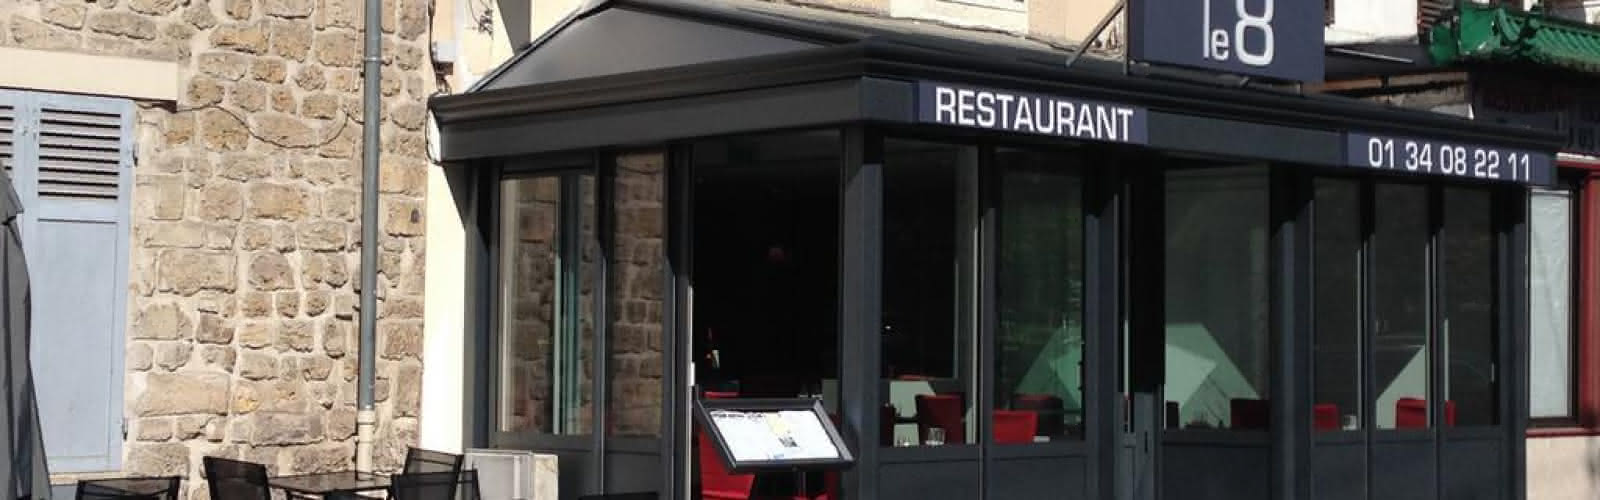 Façade du restaurant Le 8